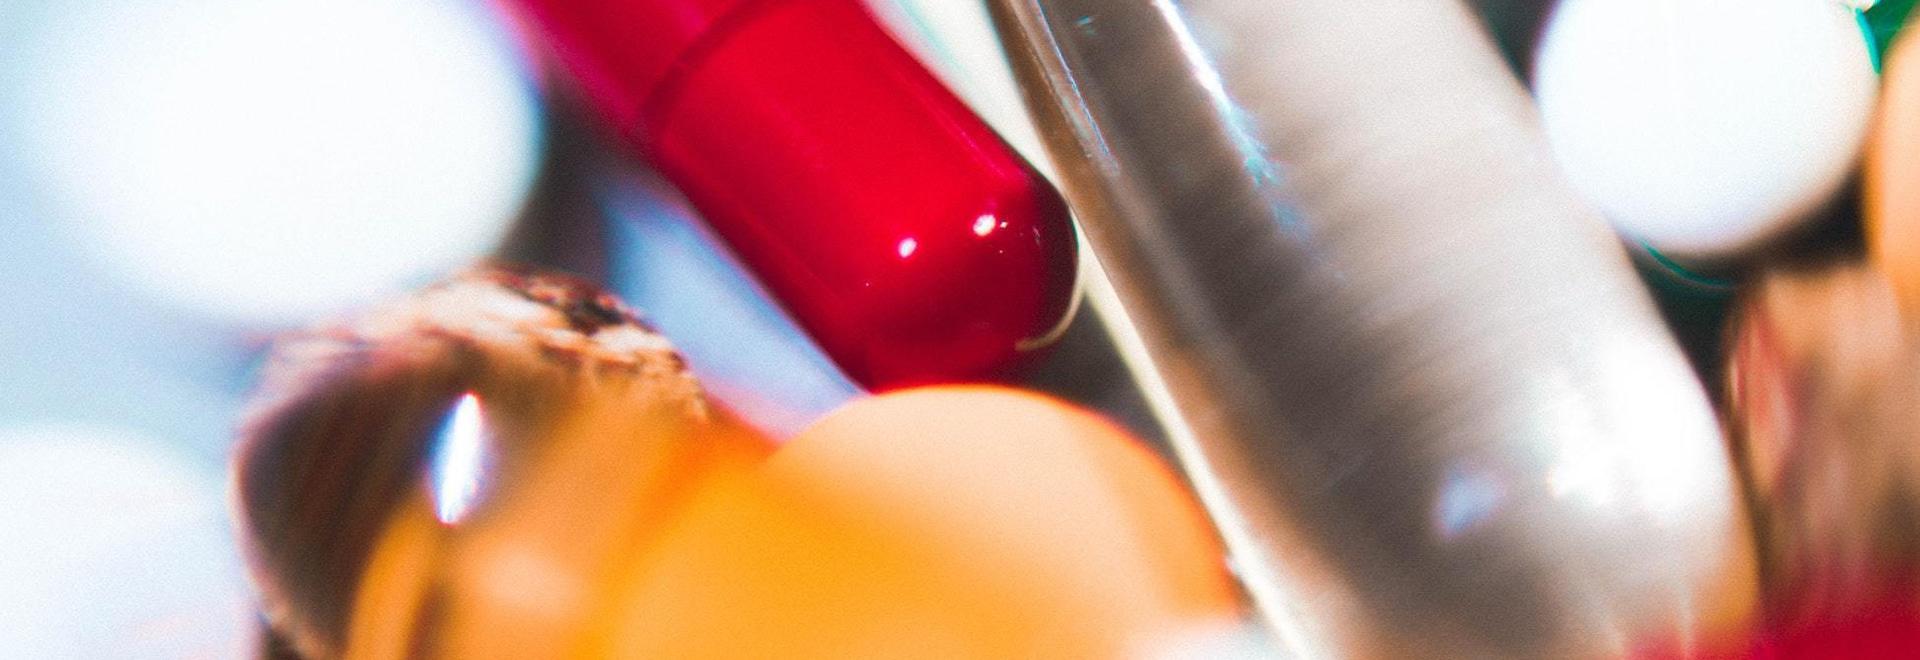 Dovato: Approved Drug for HIV-1